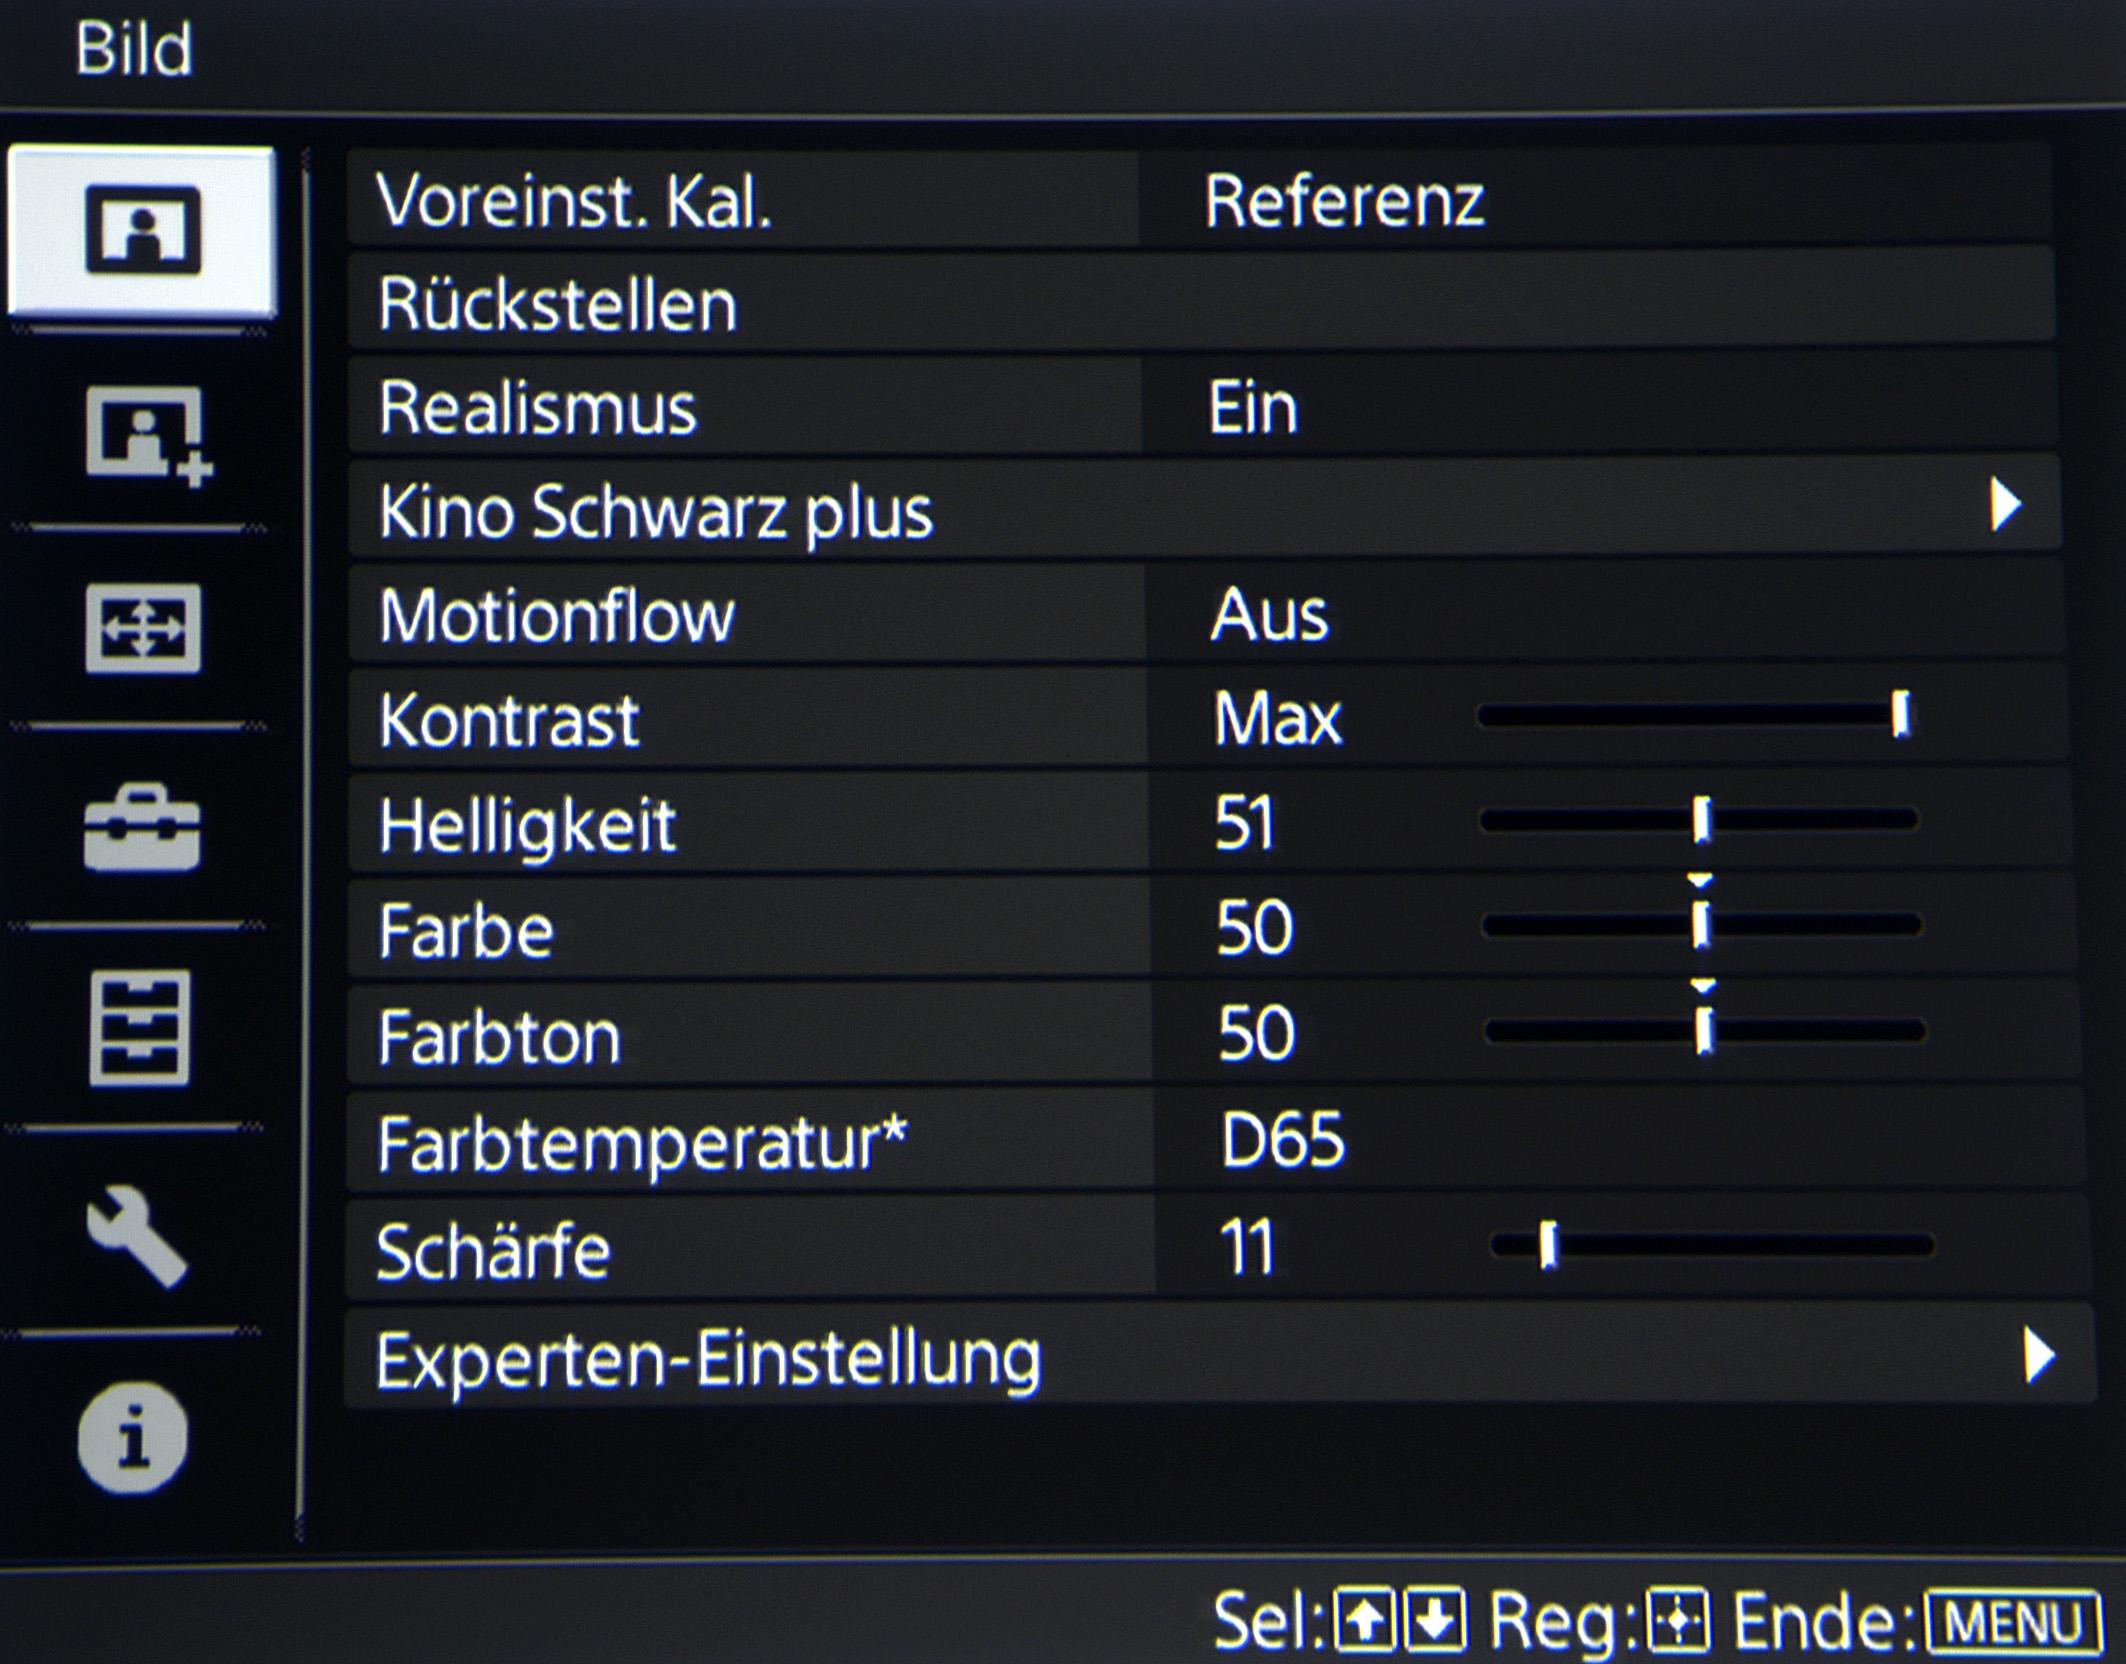 Sony VPL-VW550 - Bildmenü BILD